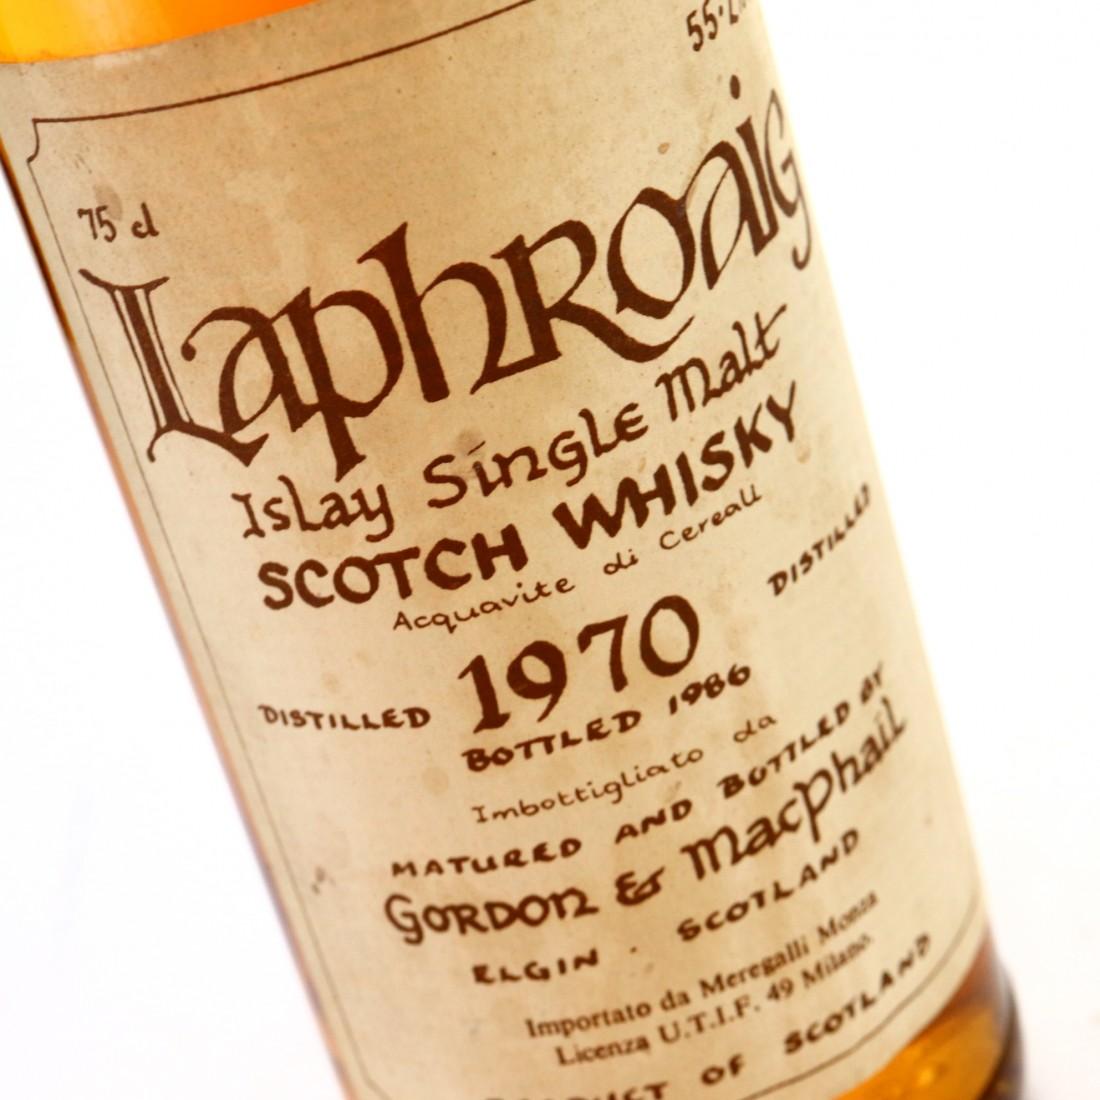 Laphroaig 1970 Gordon and MacPhail Cask Strength Celtic Label / Meregalli Import